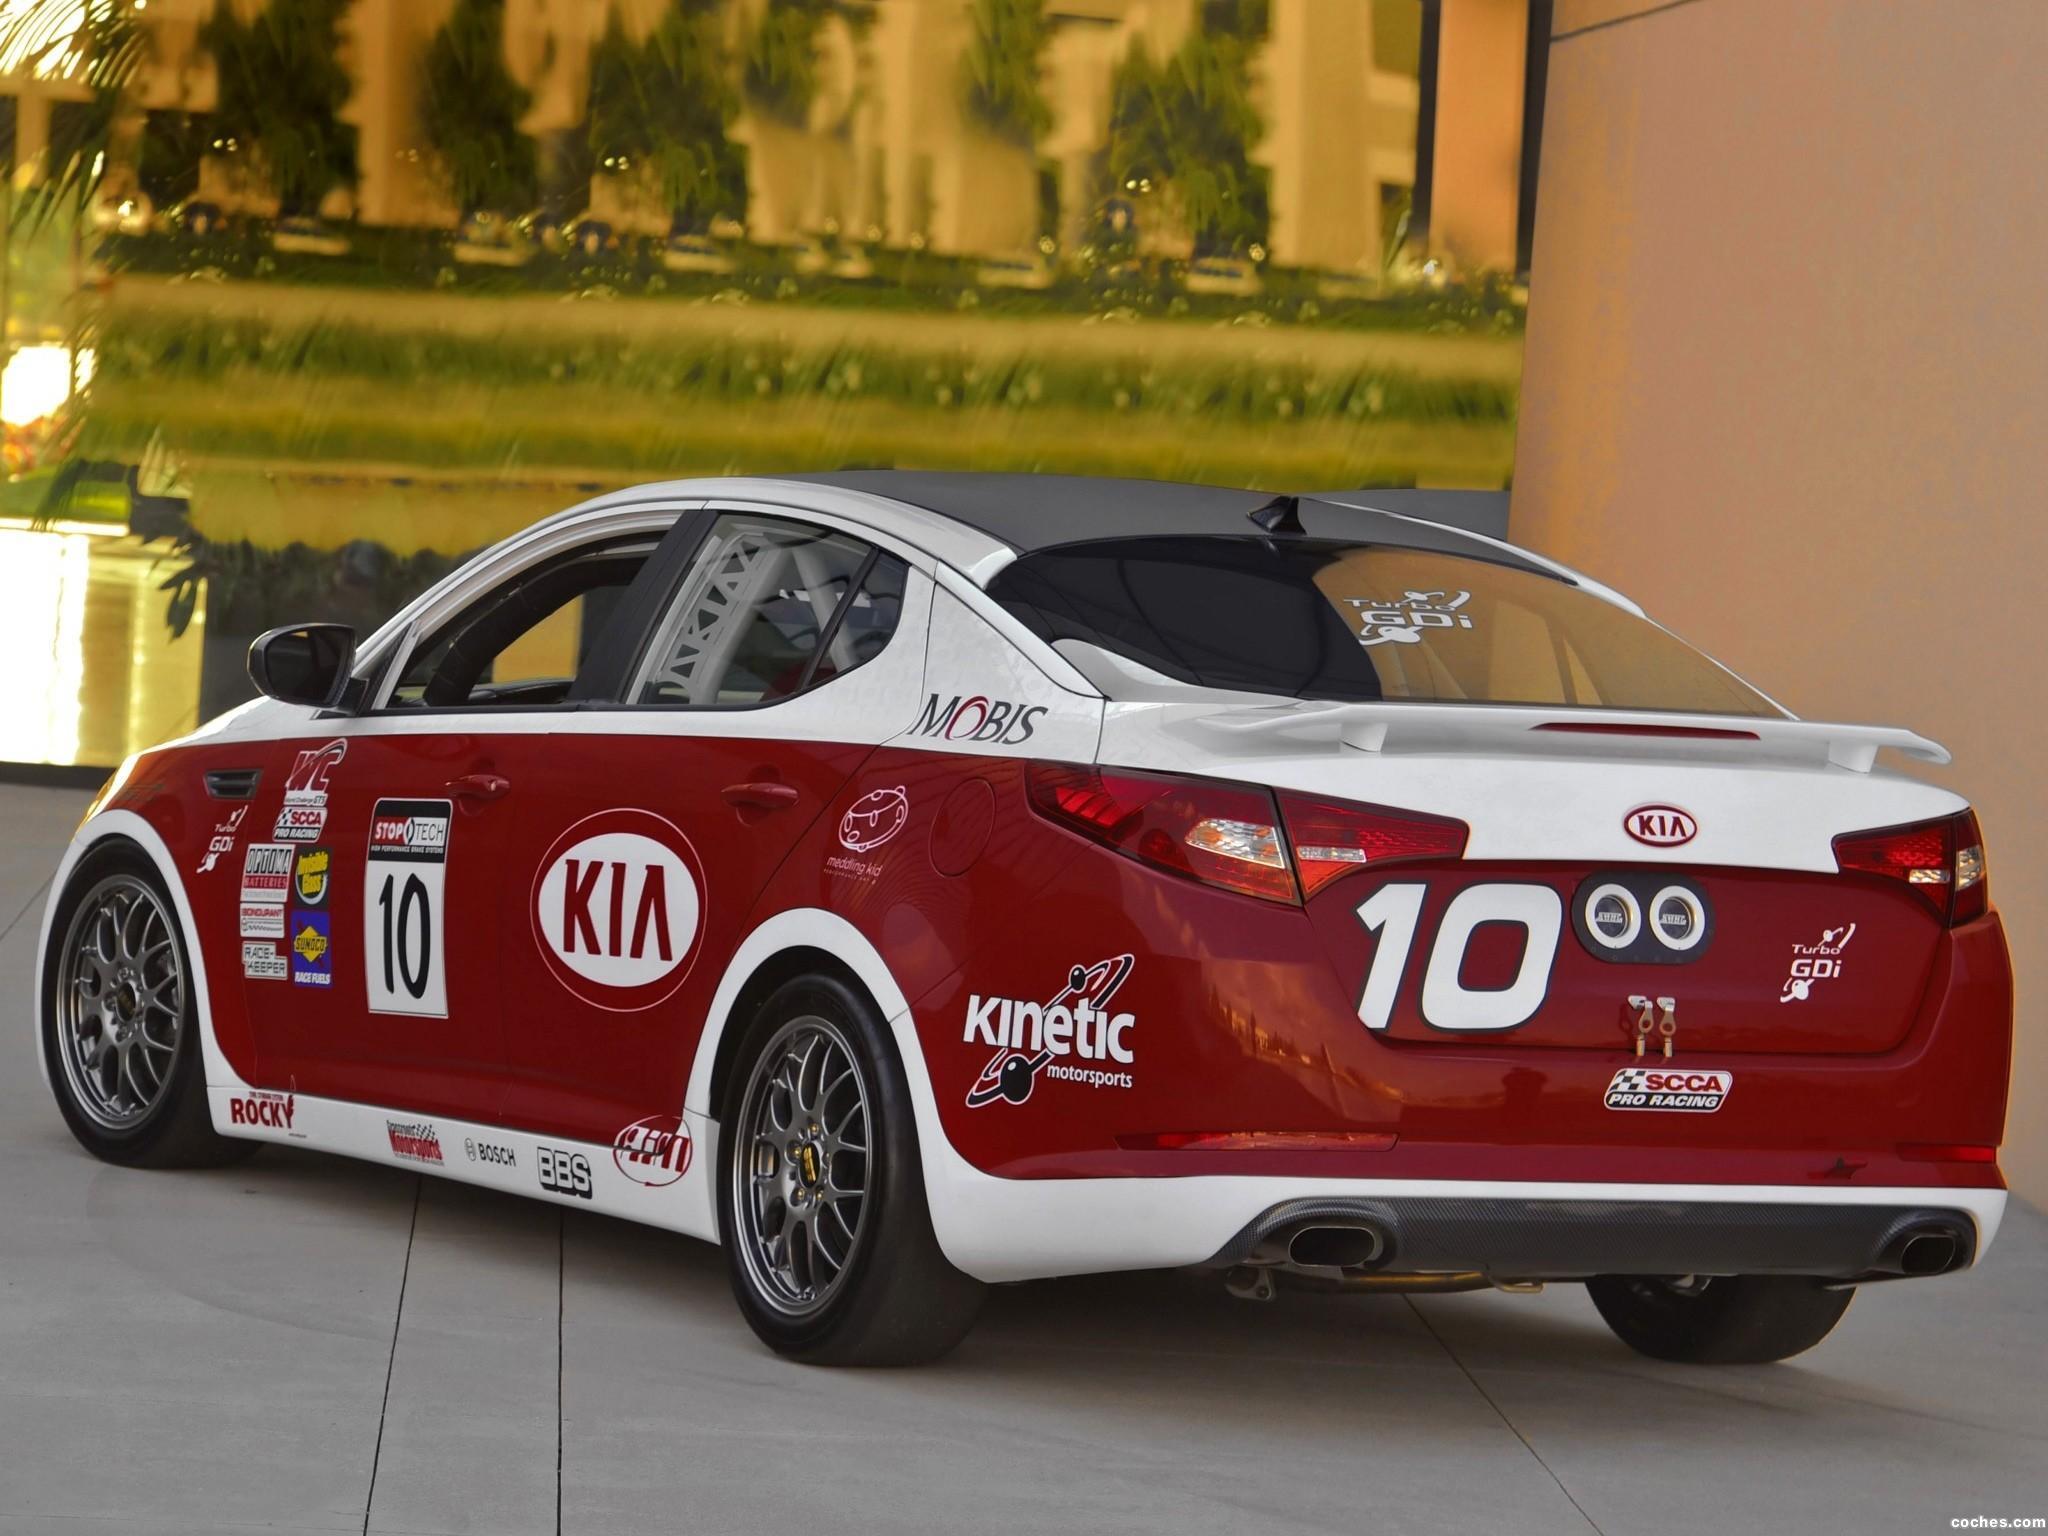 Foto 1 de Kia Optima SX World Challenge GTS Race Car 2011